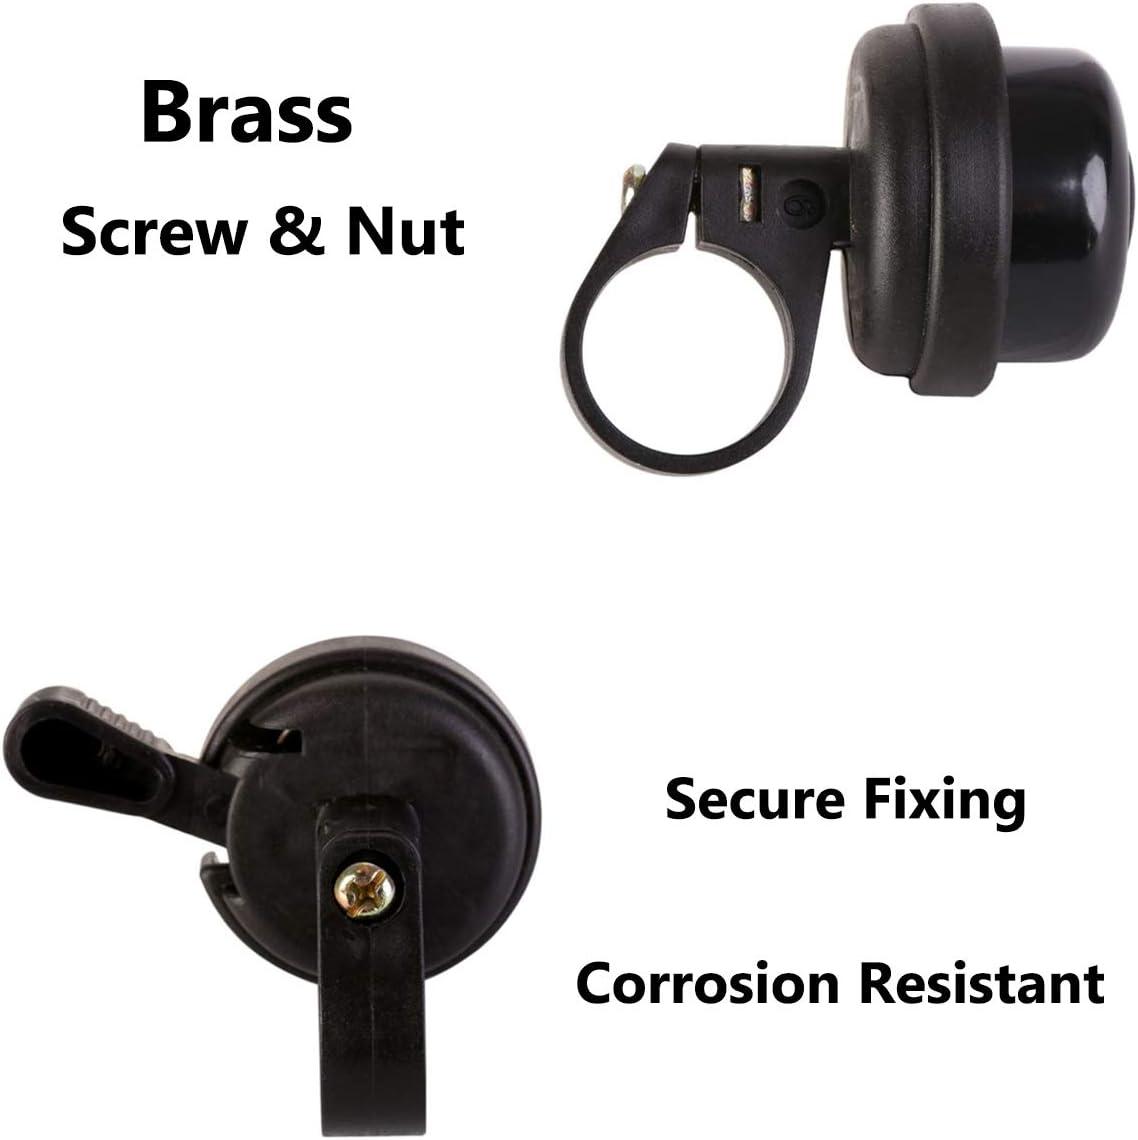 Bike Bell Brass Bicycle Bells Ring Loud Crisp Clear Sound Ringer Horn Accessories for Adults Men Women Kids Road Mountain City Sports Cruiser BMX School Bike